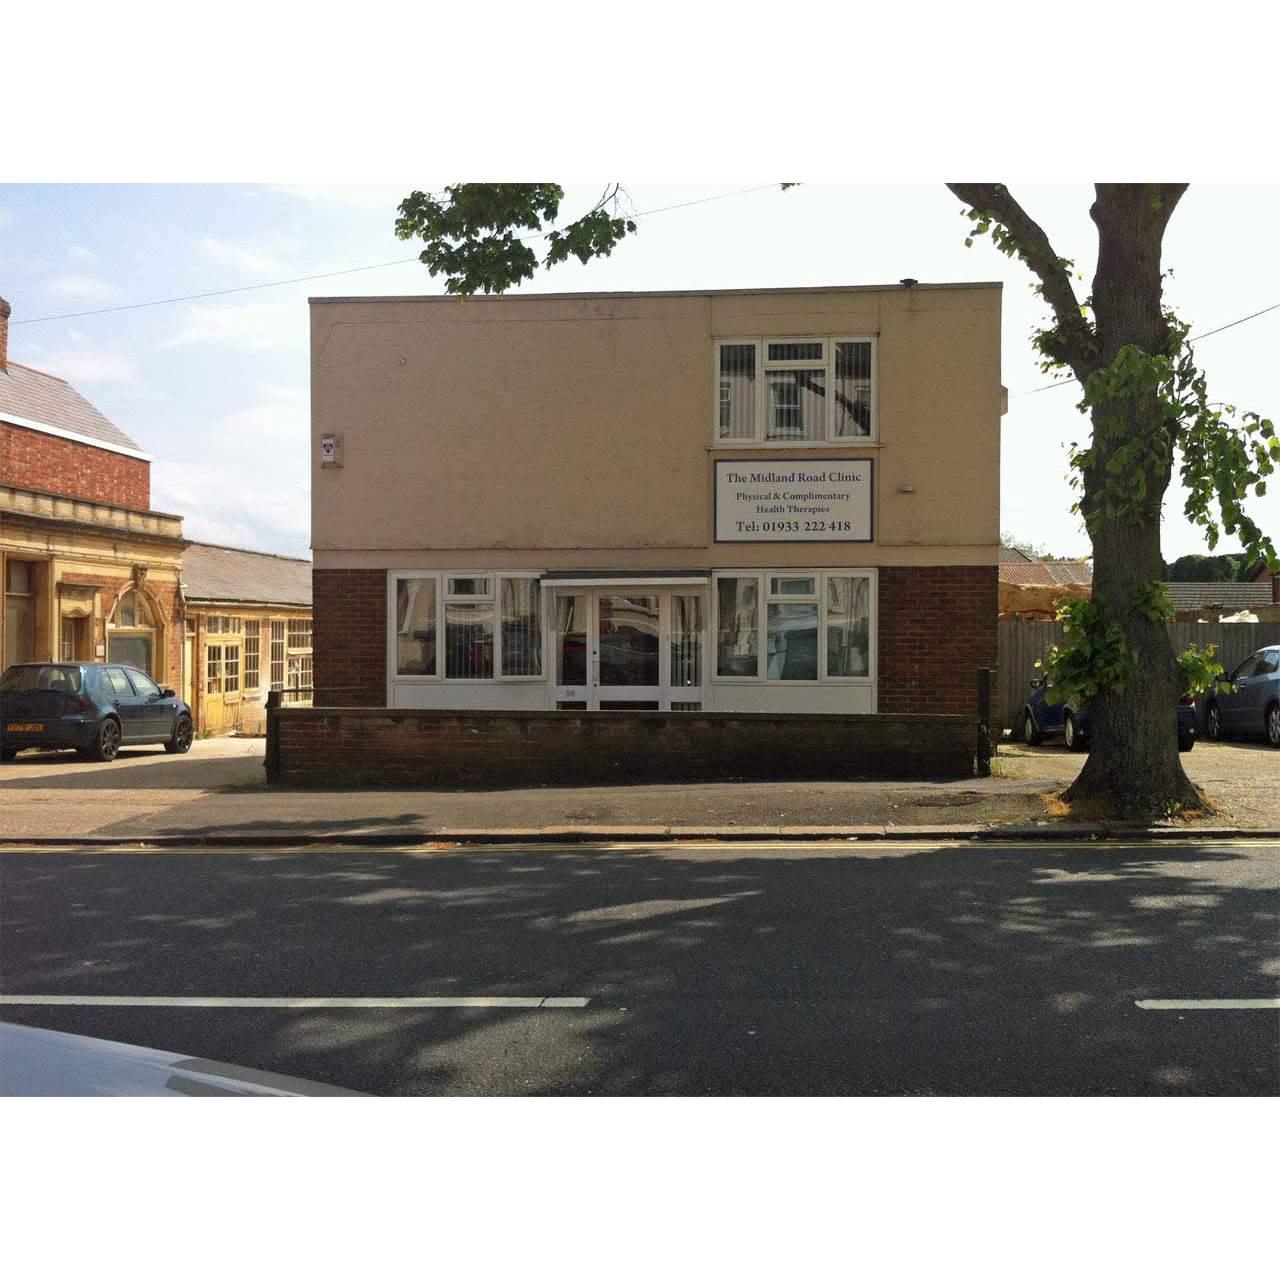 The Midland Road Clinic - Wellingborough, Northamptonshire NN8 1LU - 01933 222418 | ShowMeLocal.com